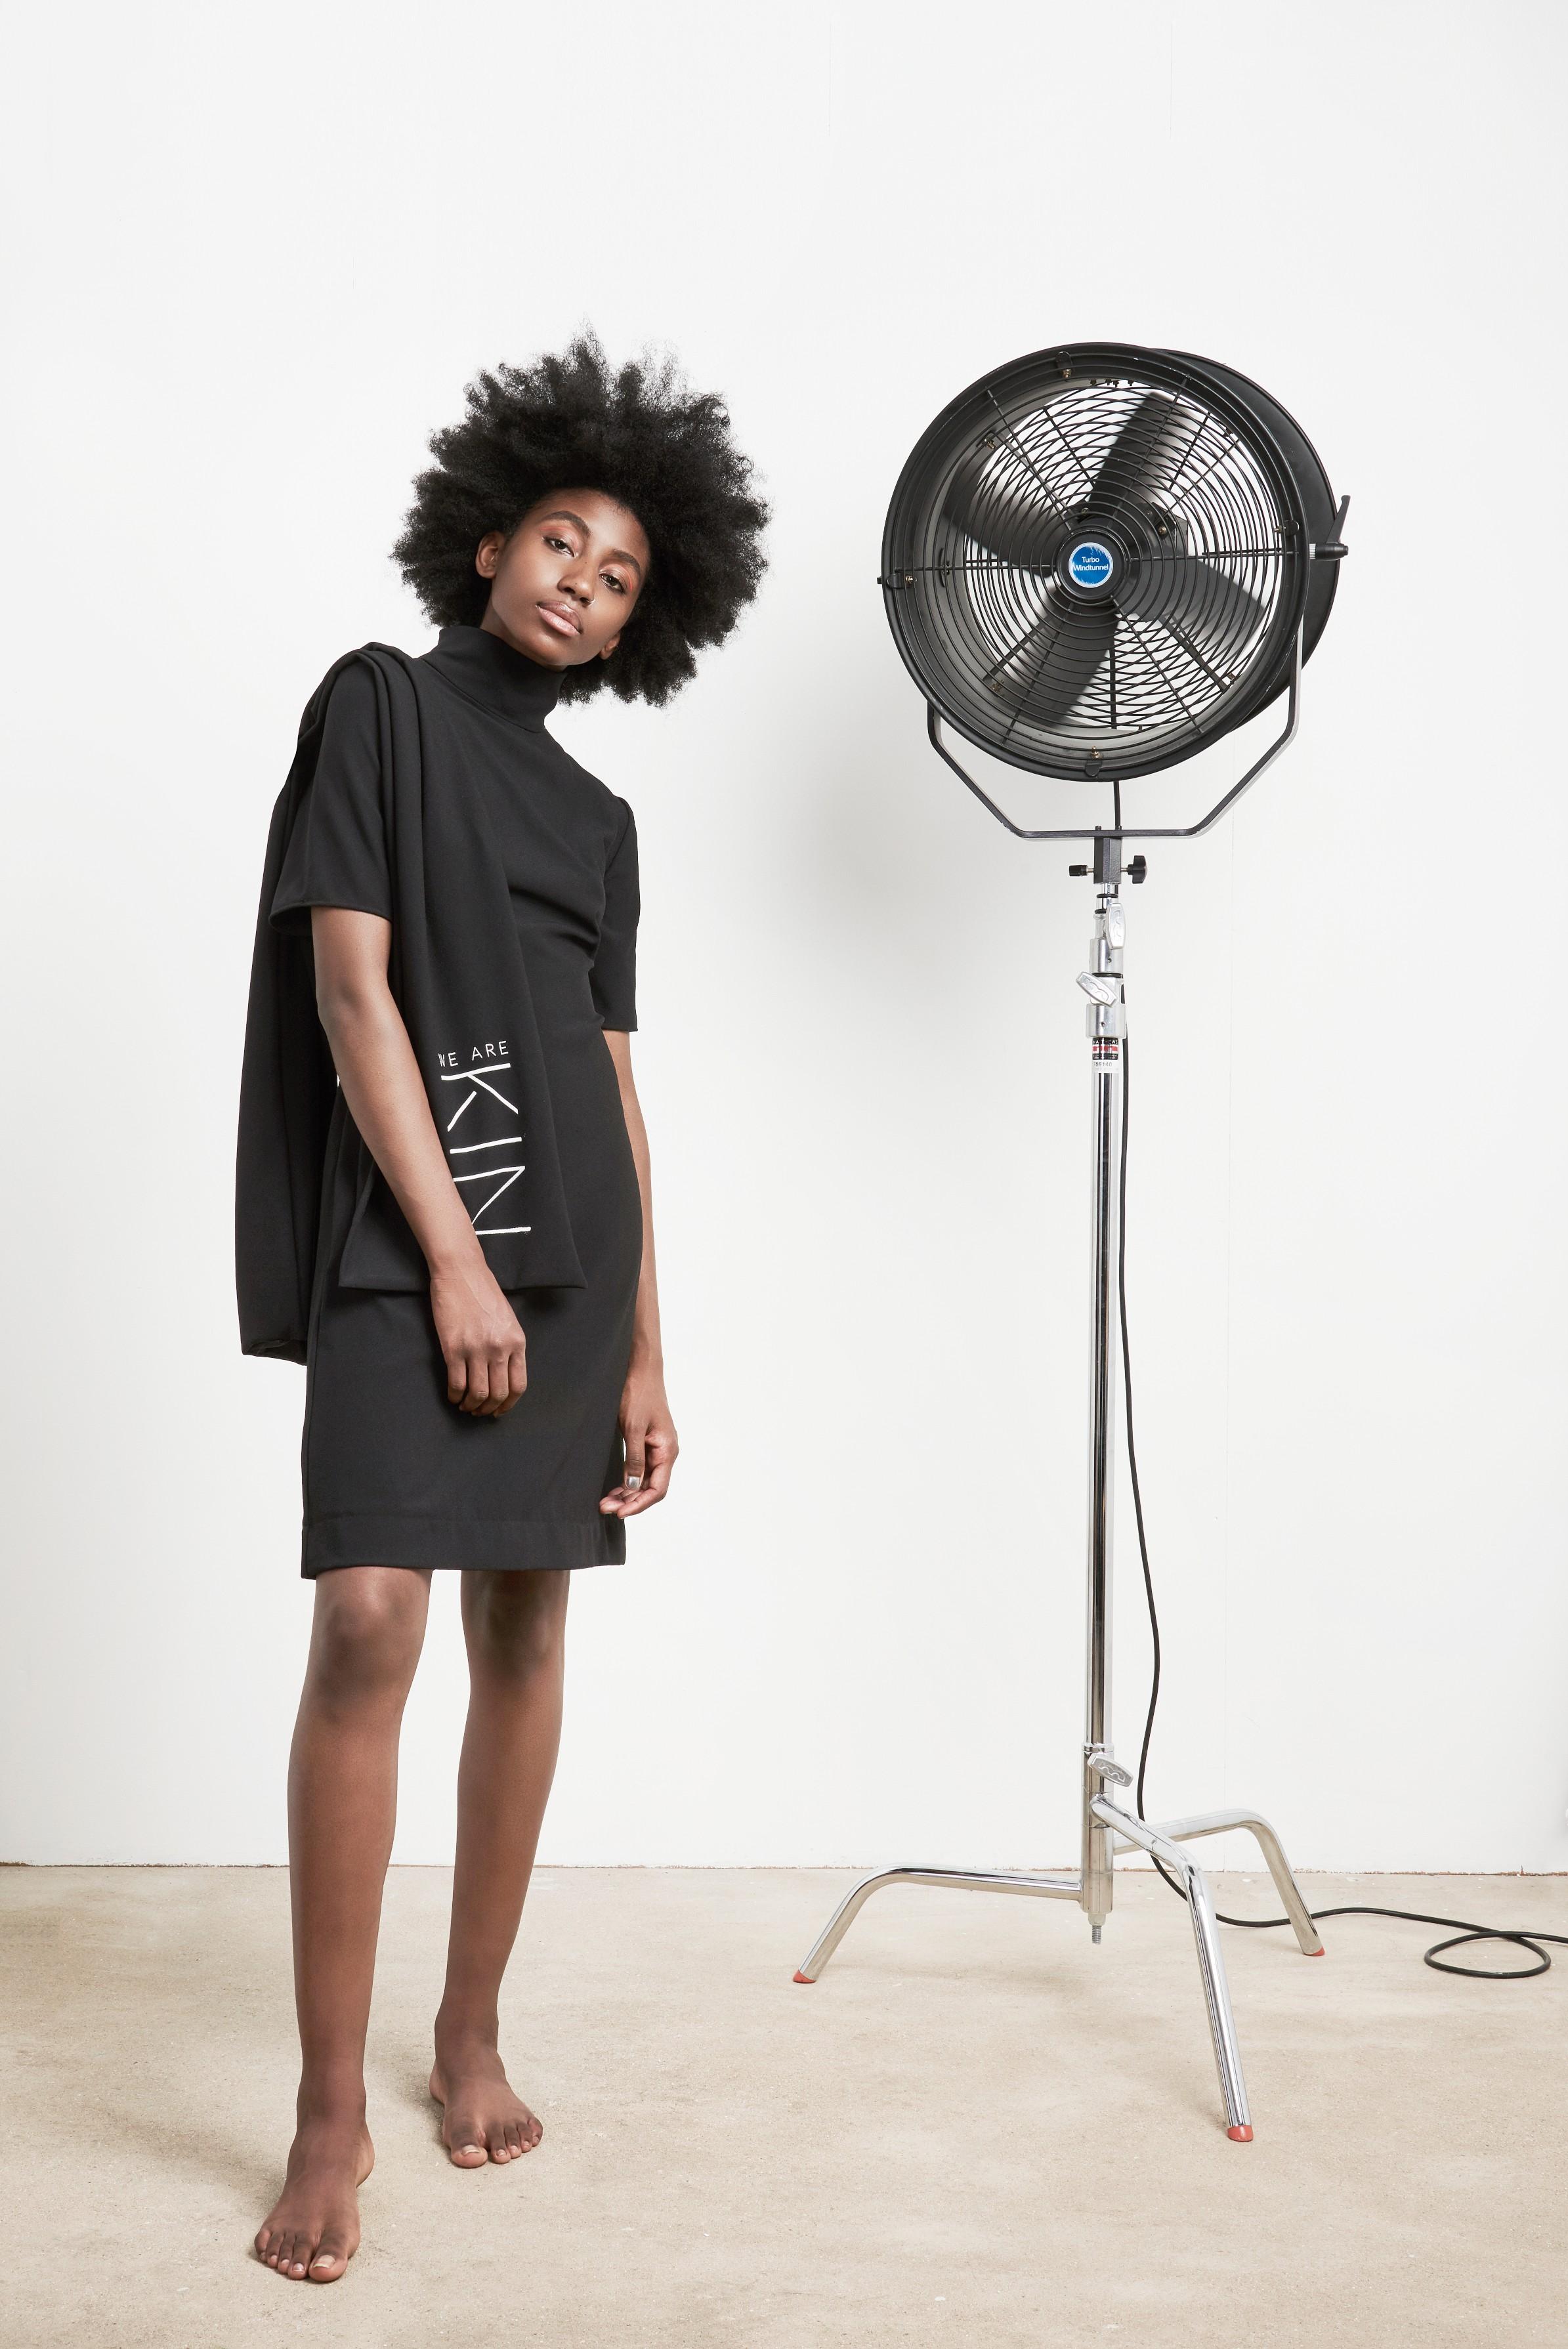 Photography - Ester Keate  MUA - Lydia Warhust  Set Design - Freya Wentworth-Stanley  Model - Ejatu Shaw  Stylist - Melissa Holdbrook-Akpose